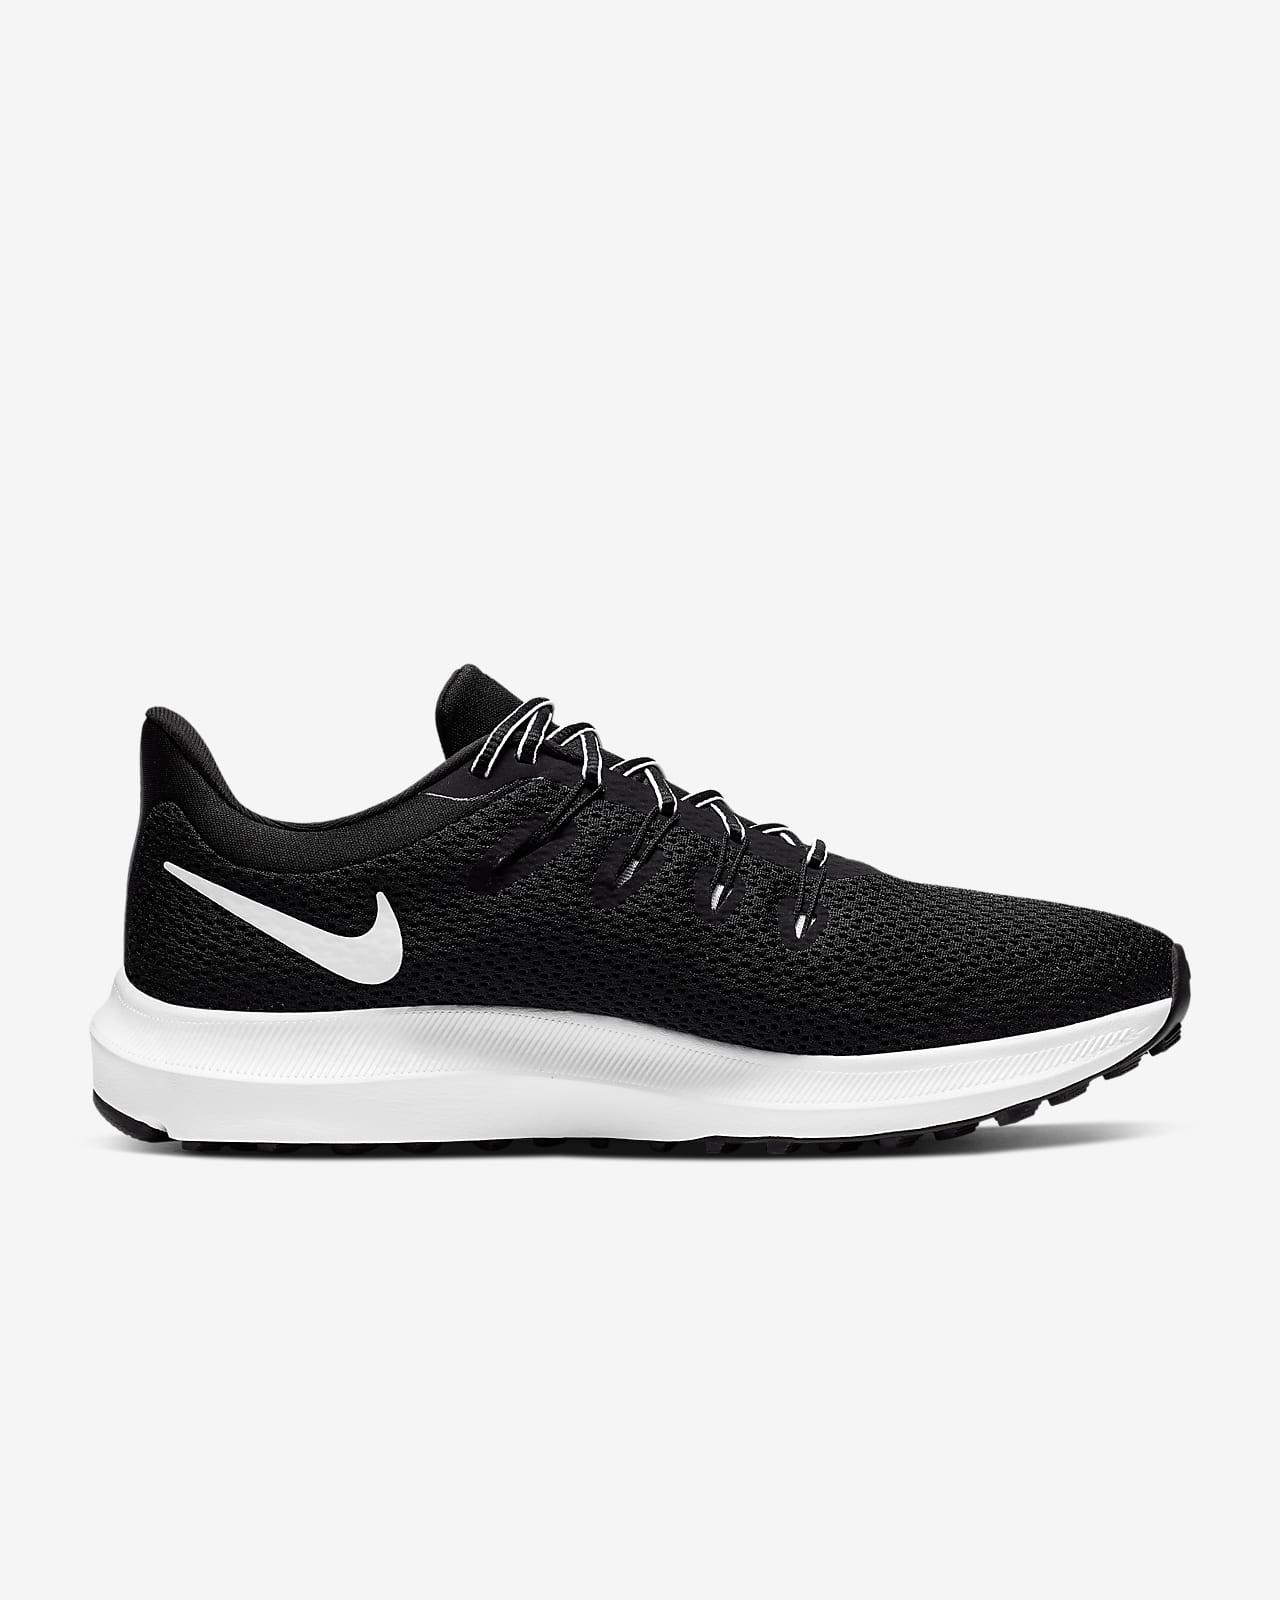 Calzado de running para mujer Nike Quest 2